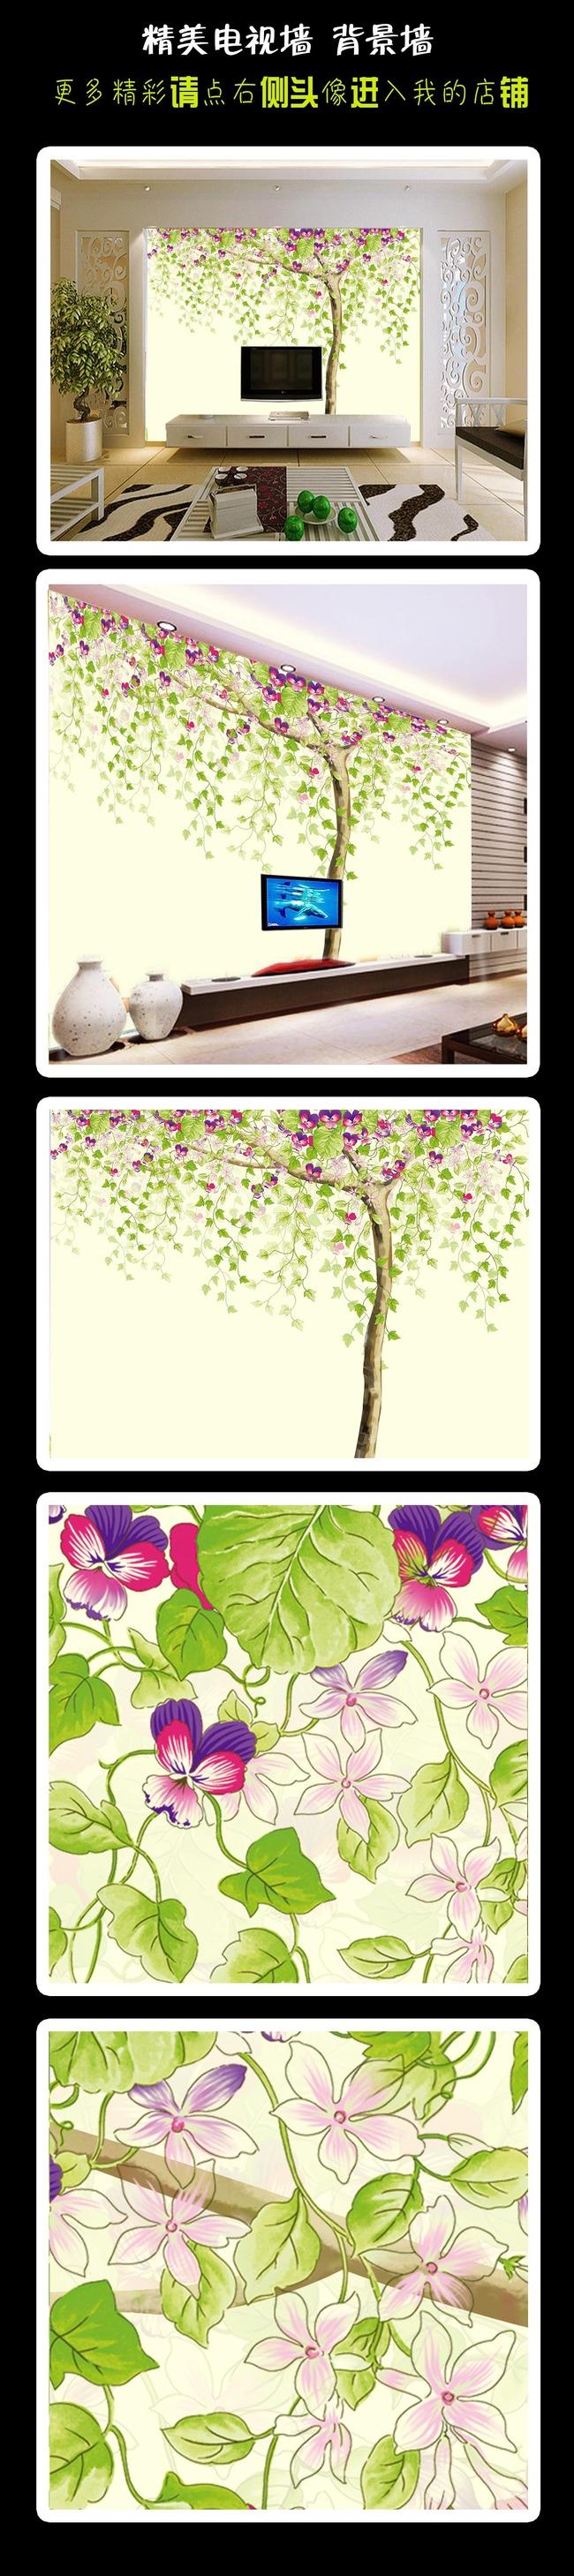 【jpg】高清手绘现代简约抽象大树电视背景墙